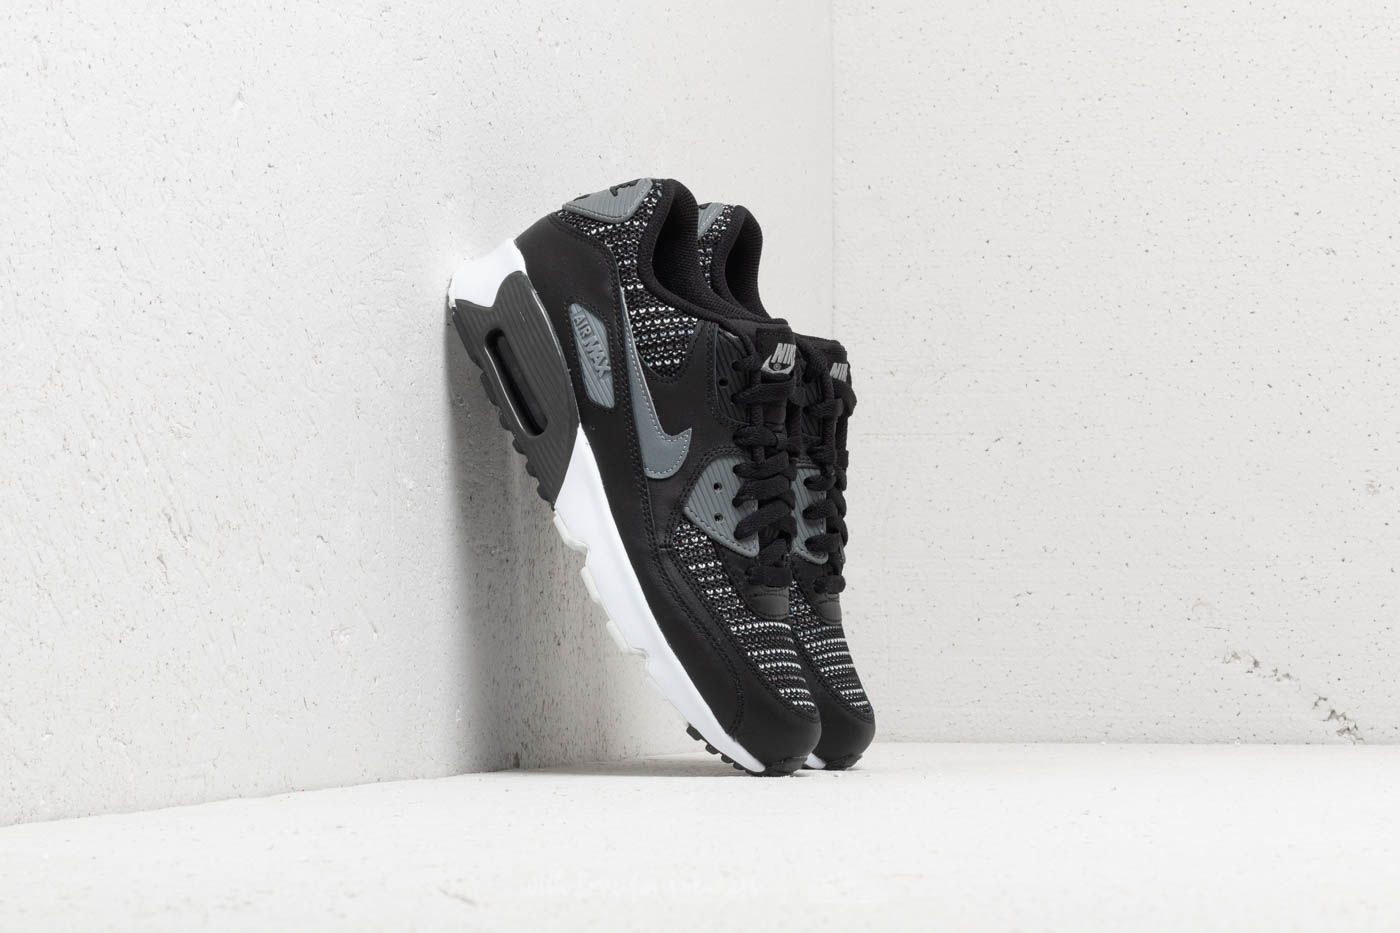 Nike Air Max 93 BlackCool Grey Anthracite | Footshop